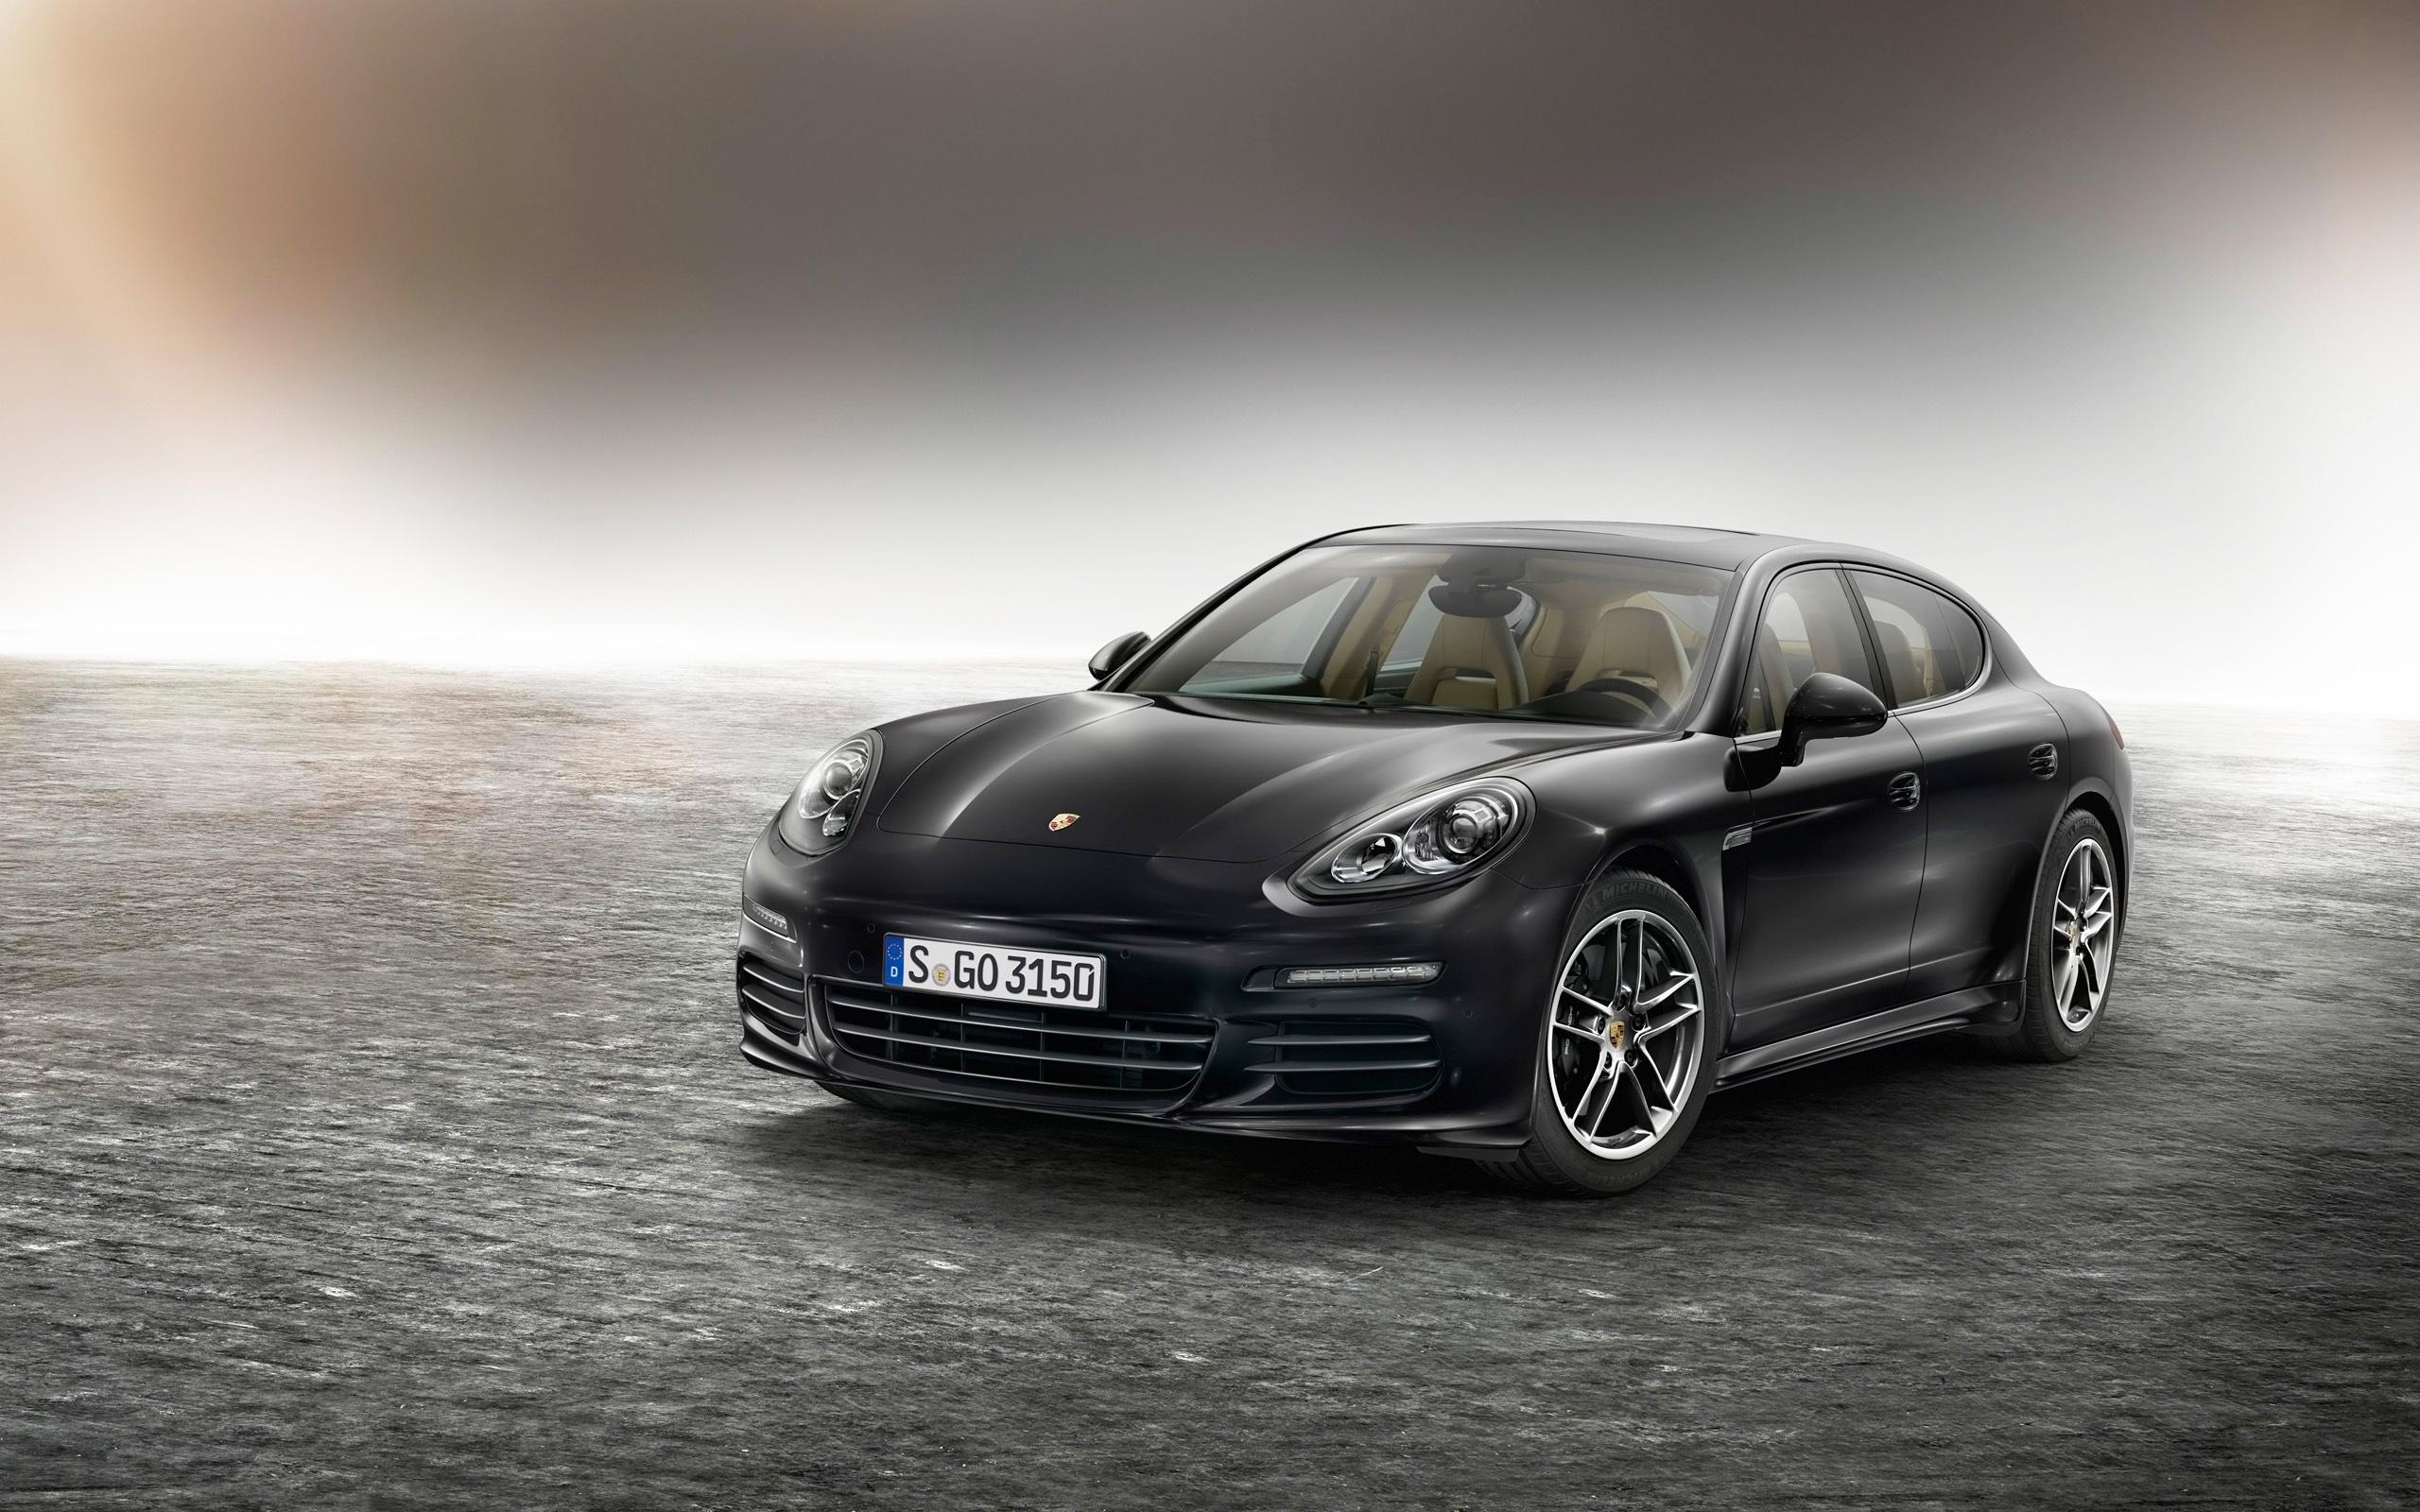 Porsche Panamera Widescreen Wallpaper